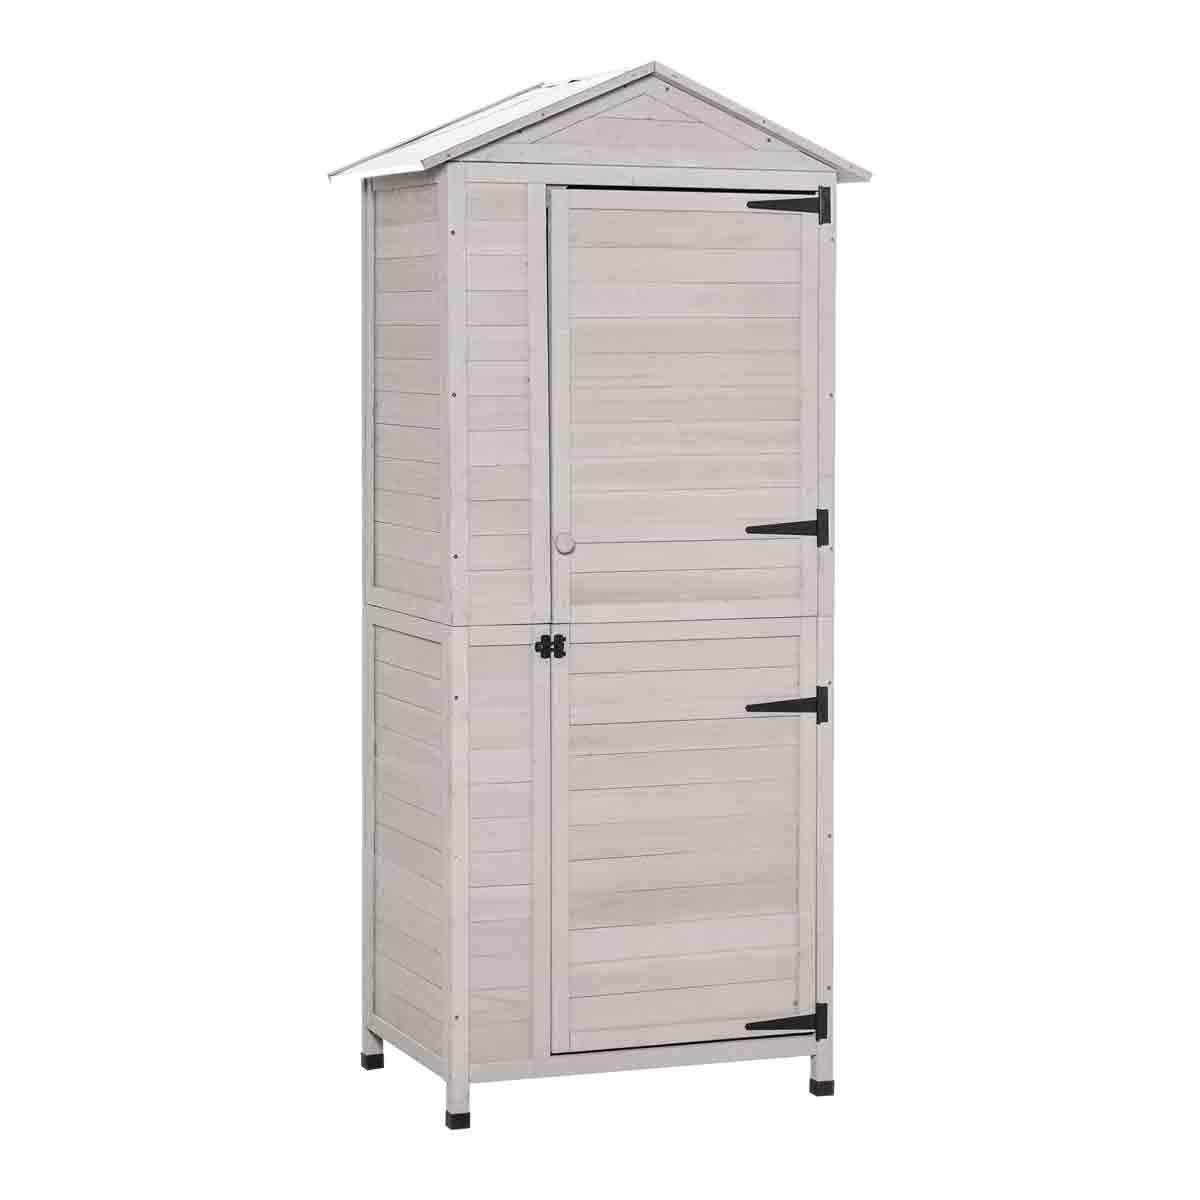 Outsunny 2' 11' x 2' Wooden 4-Tier Garden Storage Cabinet - Light Grey